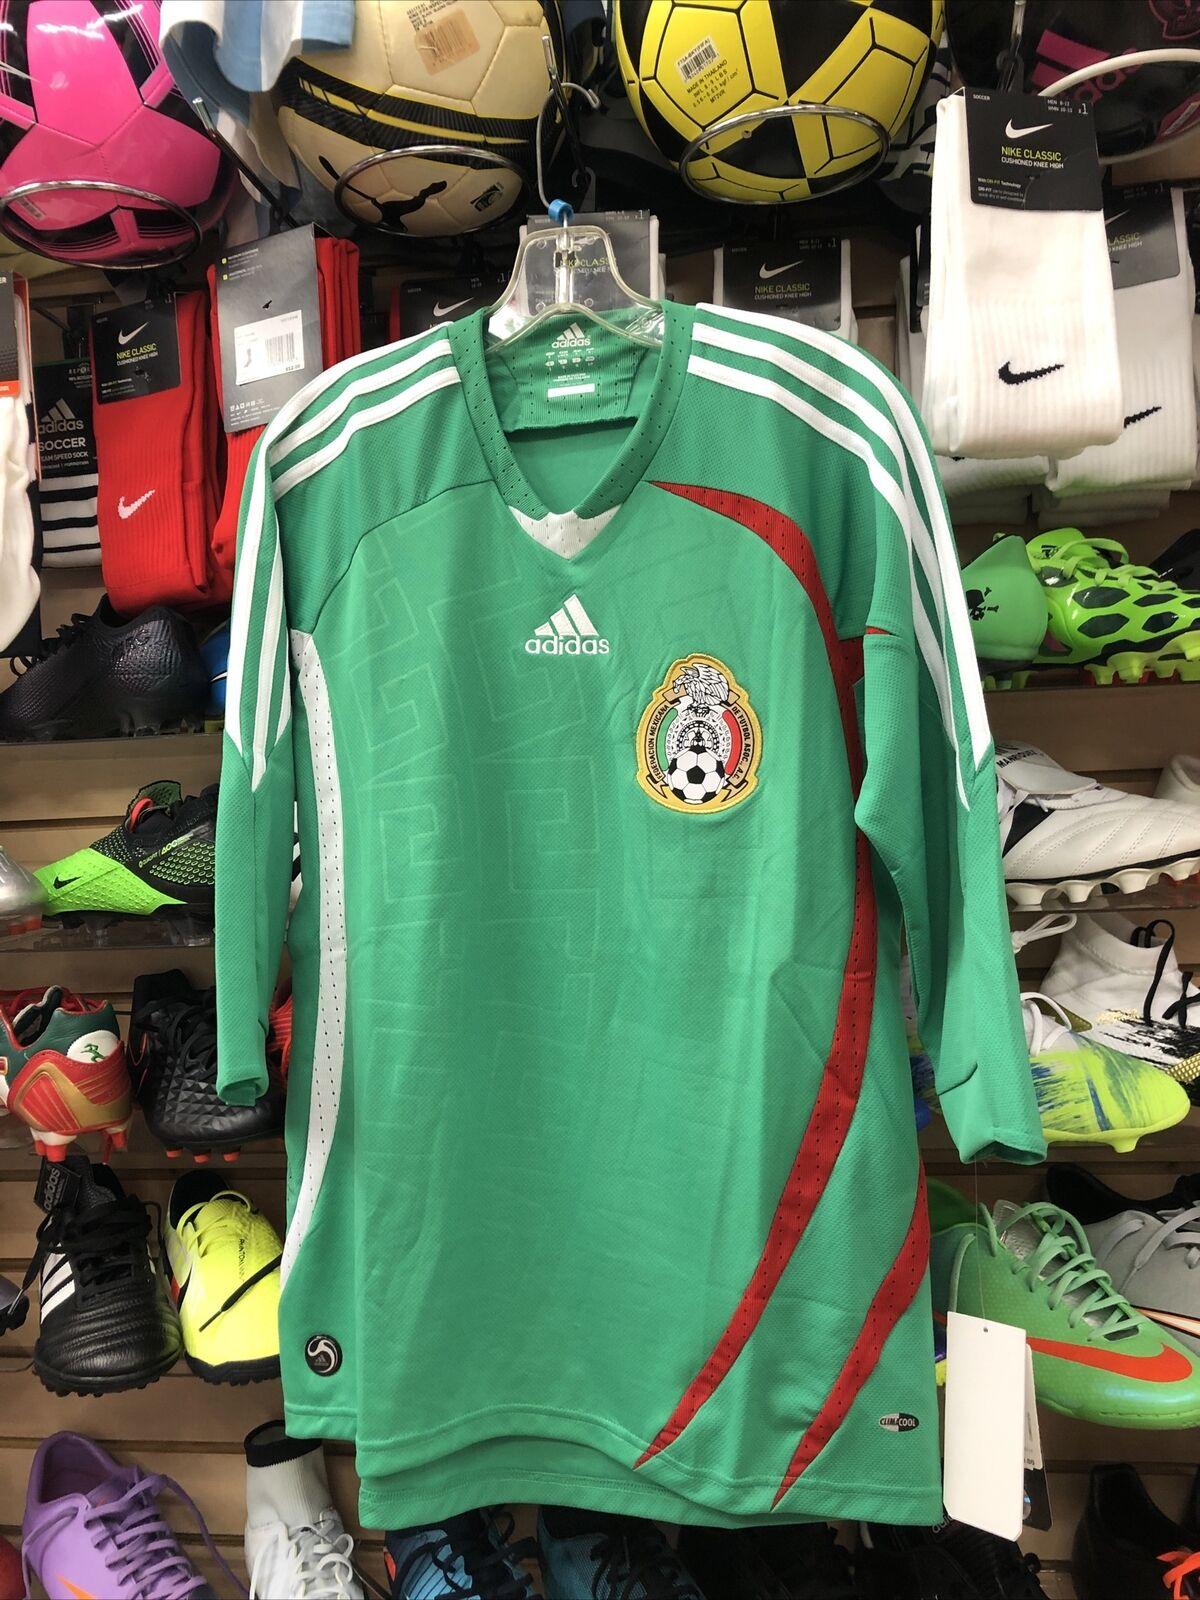 adidas Vintage Mexico FMF Home Soccer Football Futbol Jersey Men's ...